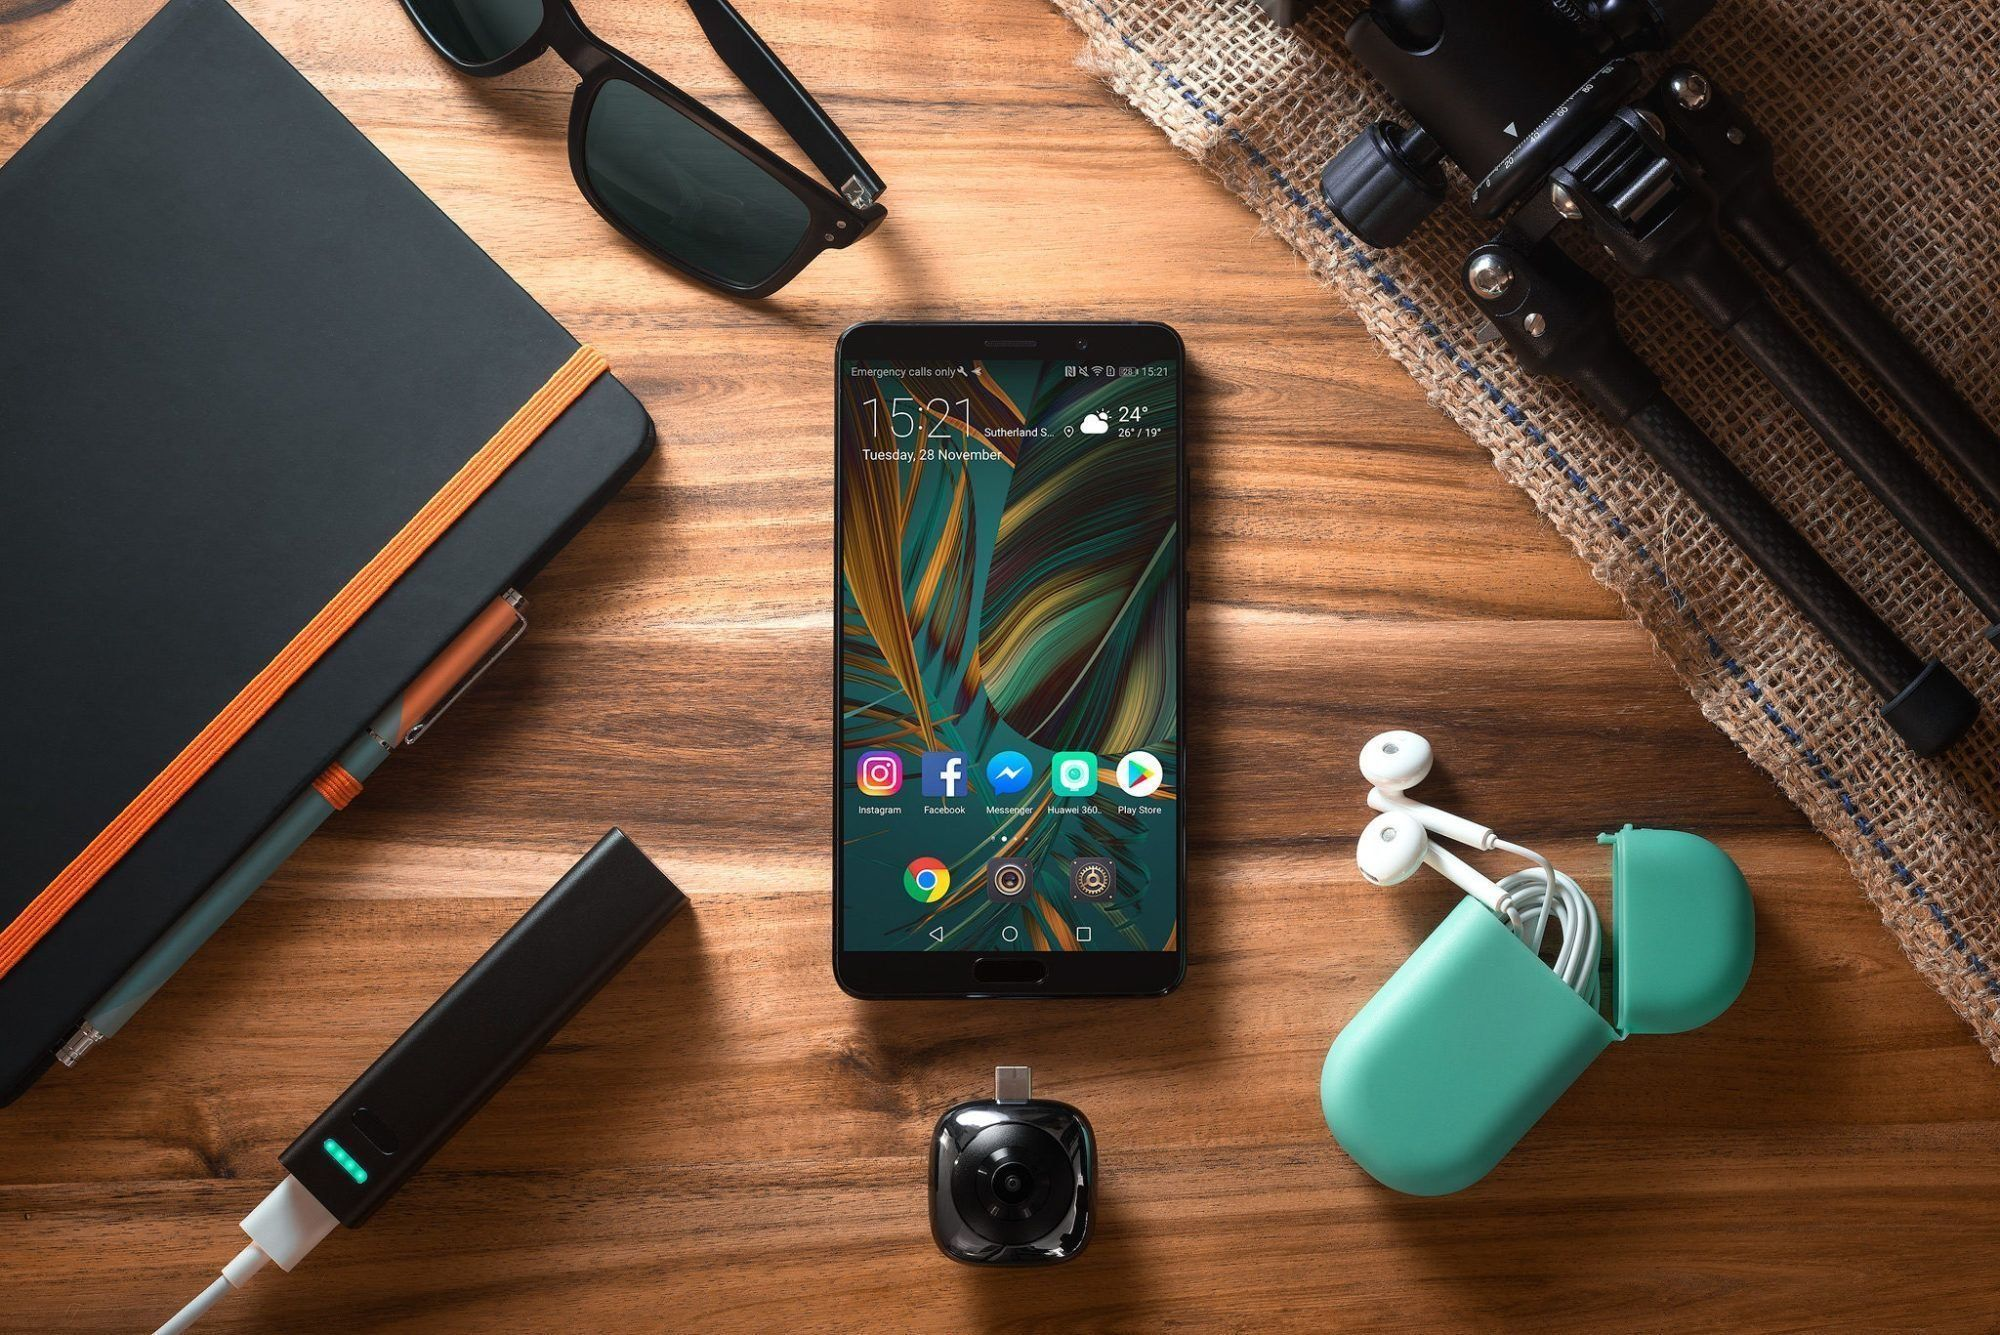 Смартфон Huawei Mate 10 Dual Sim: Год прошел, подведем итоги